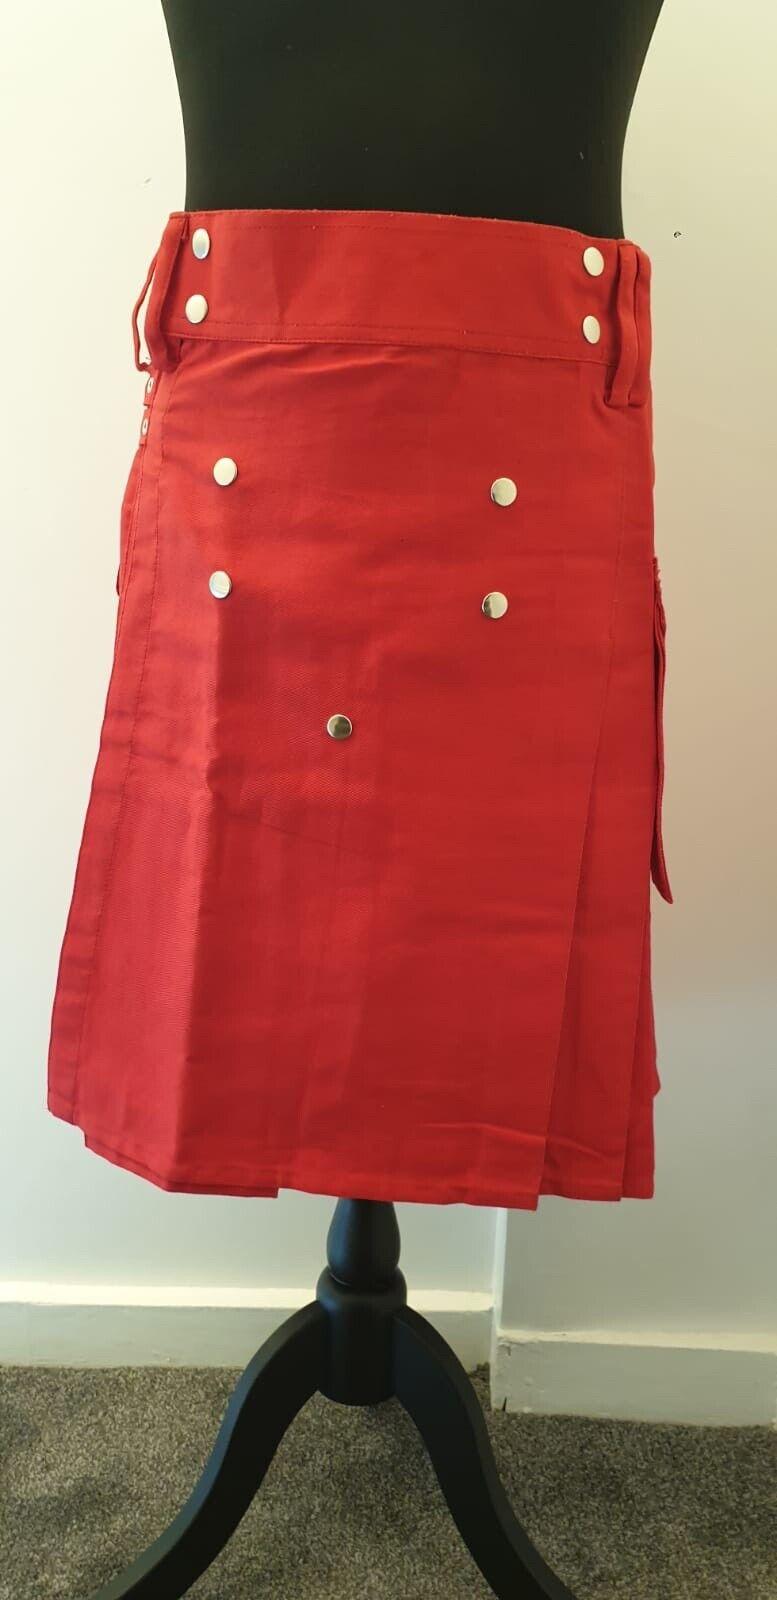 Men's Brand New Red Cotton Utility Kilt 34 Size, Good Quality 100% Cotton